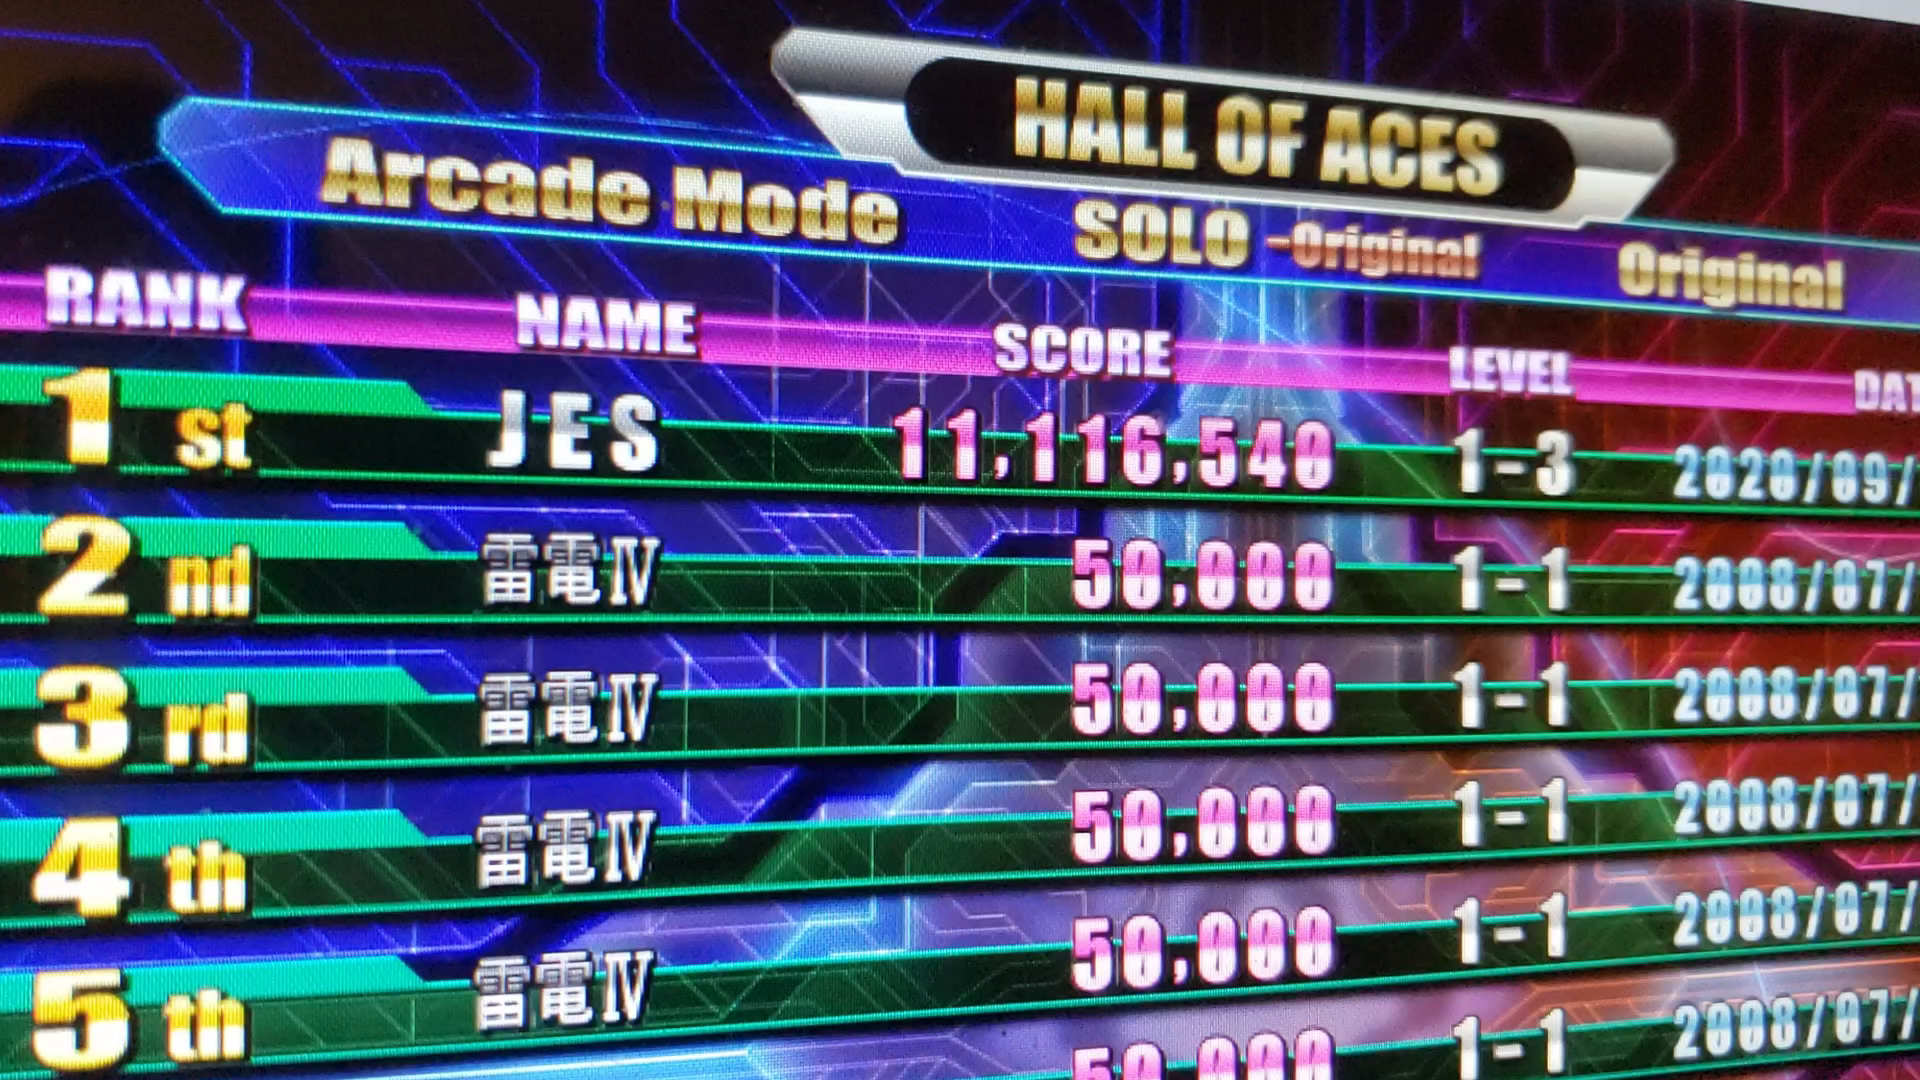 JES: Raiden IV: Overkill [Arcade Mode/Original] (PC) 11,116,540 points on 2020-09-11 02:01:04